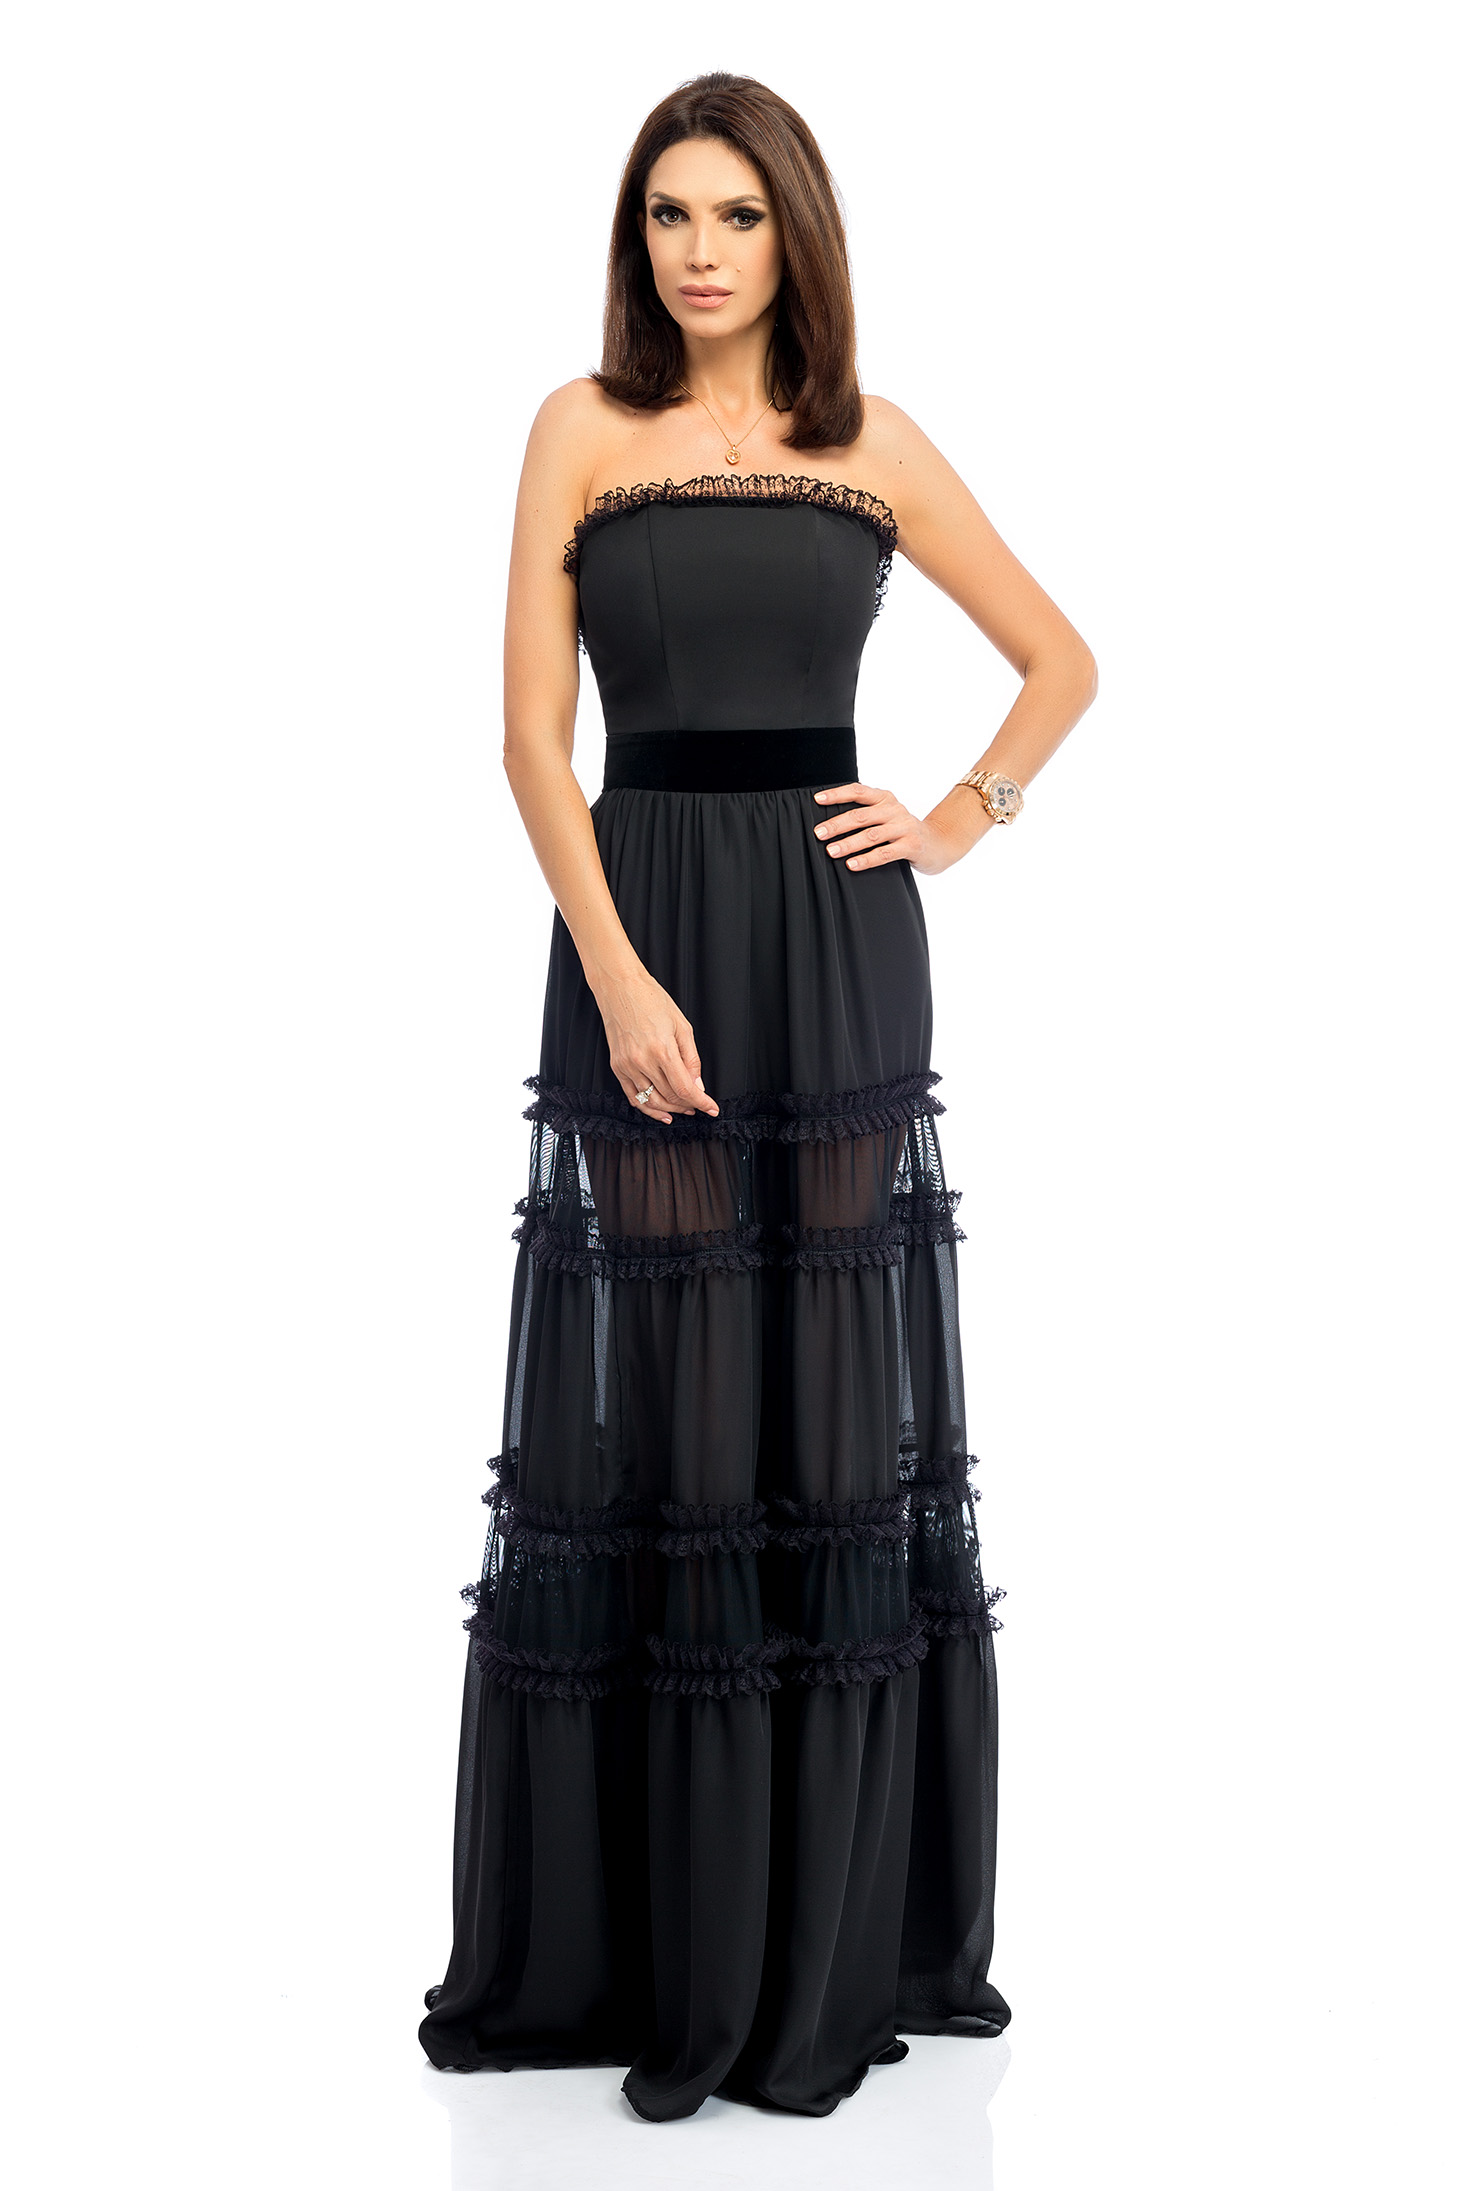 Rochie neagra maxi eleganta de ocazie in clos tip corset